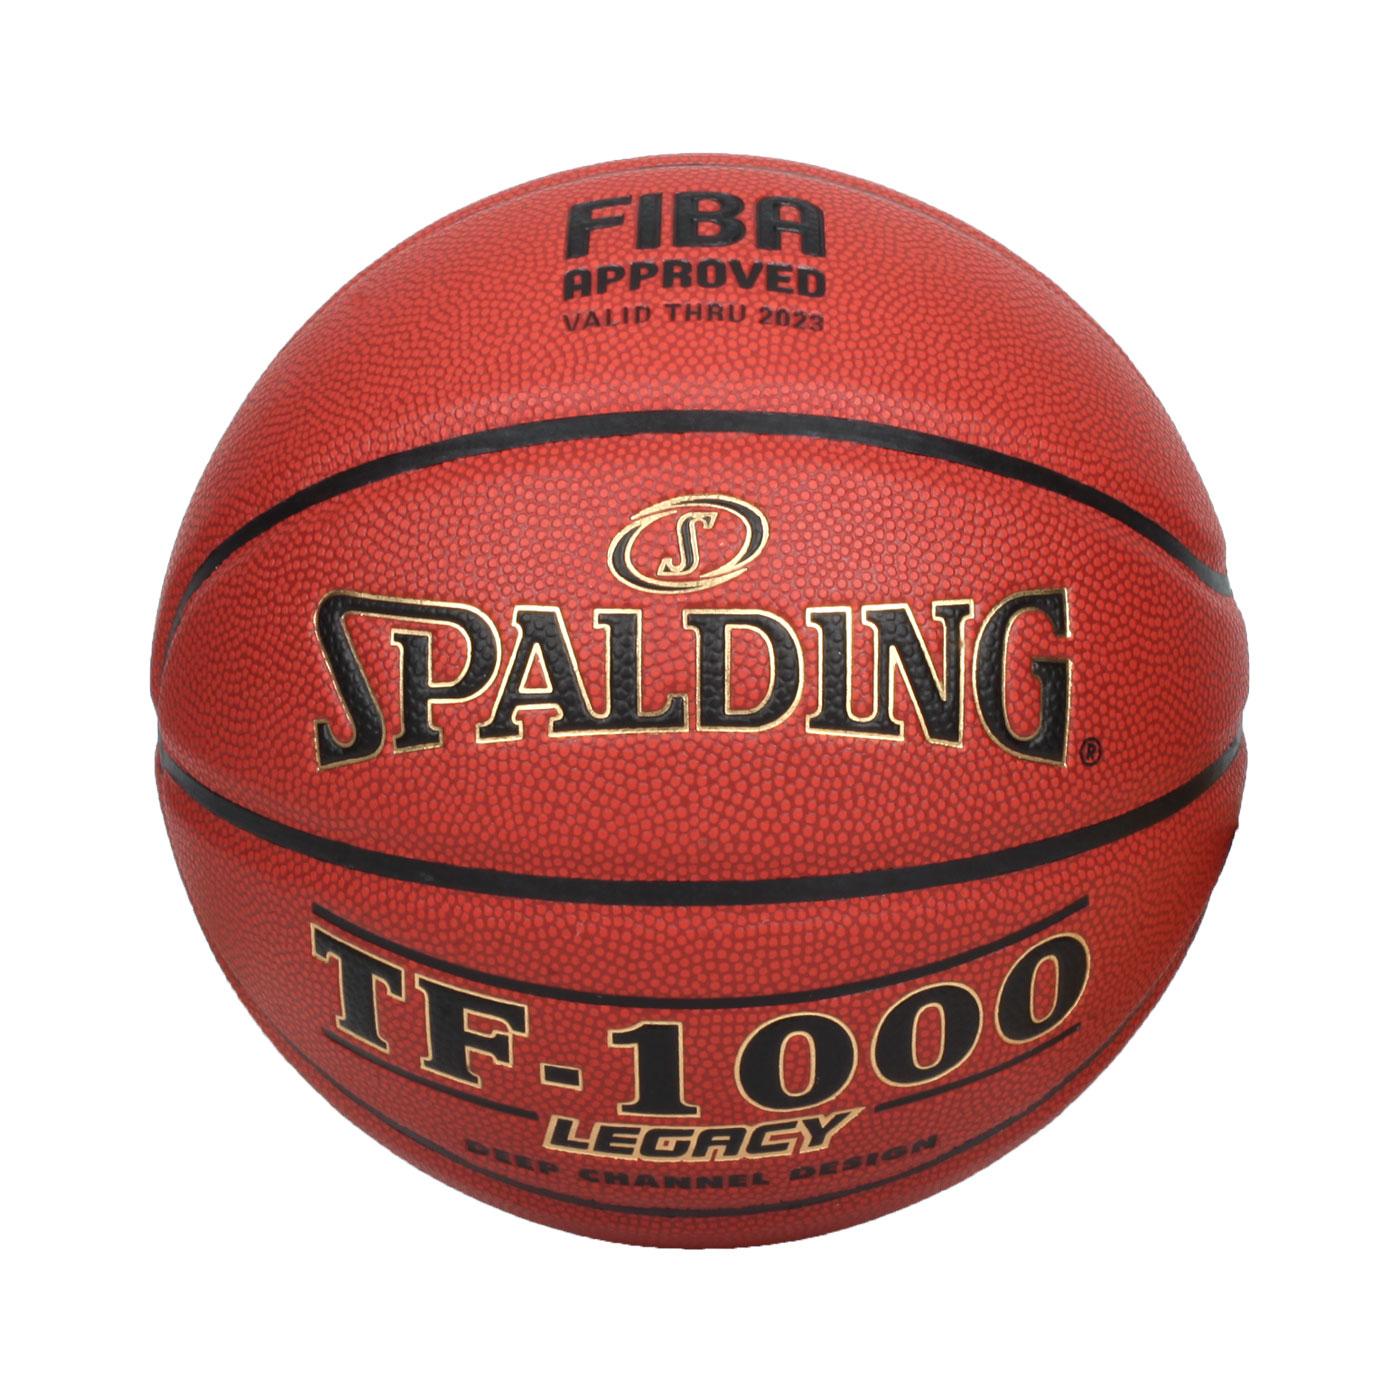 SPALDING TF-1000 Legacy 室內籃球#6號 SPA74451